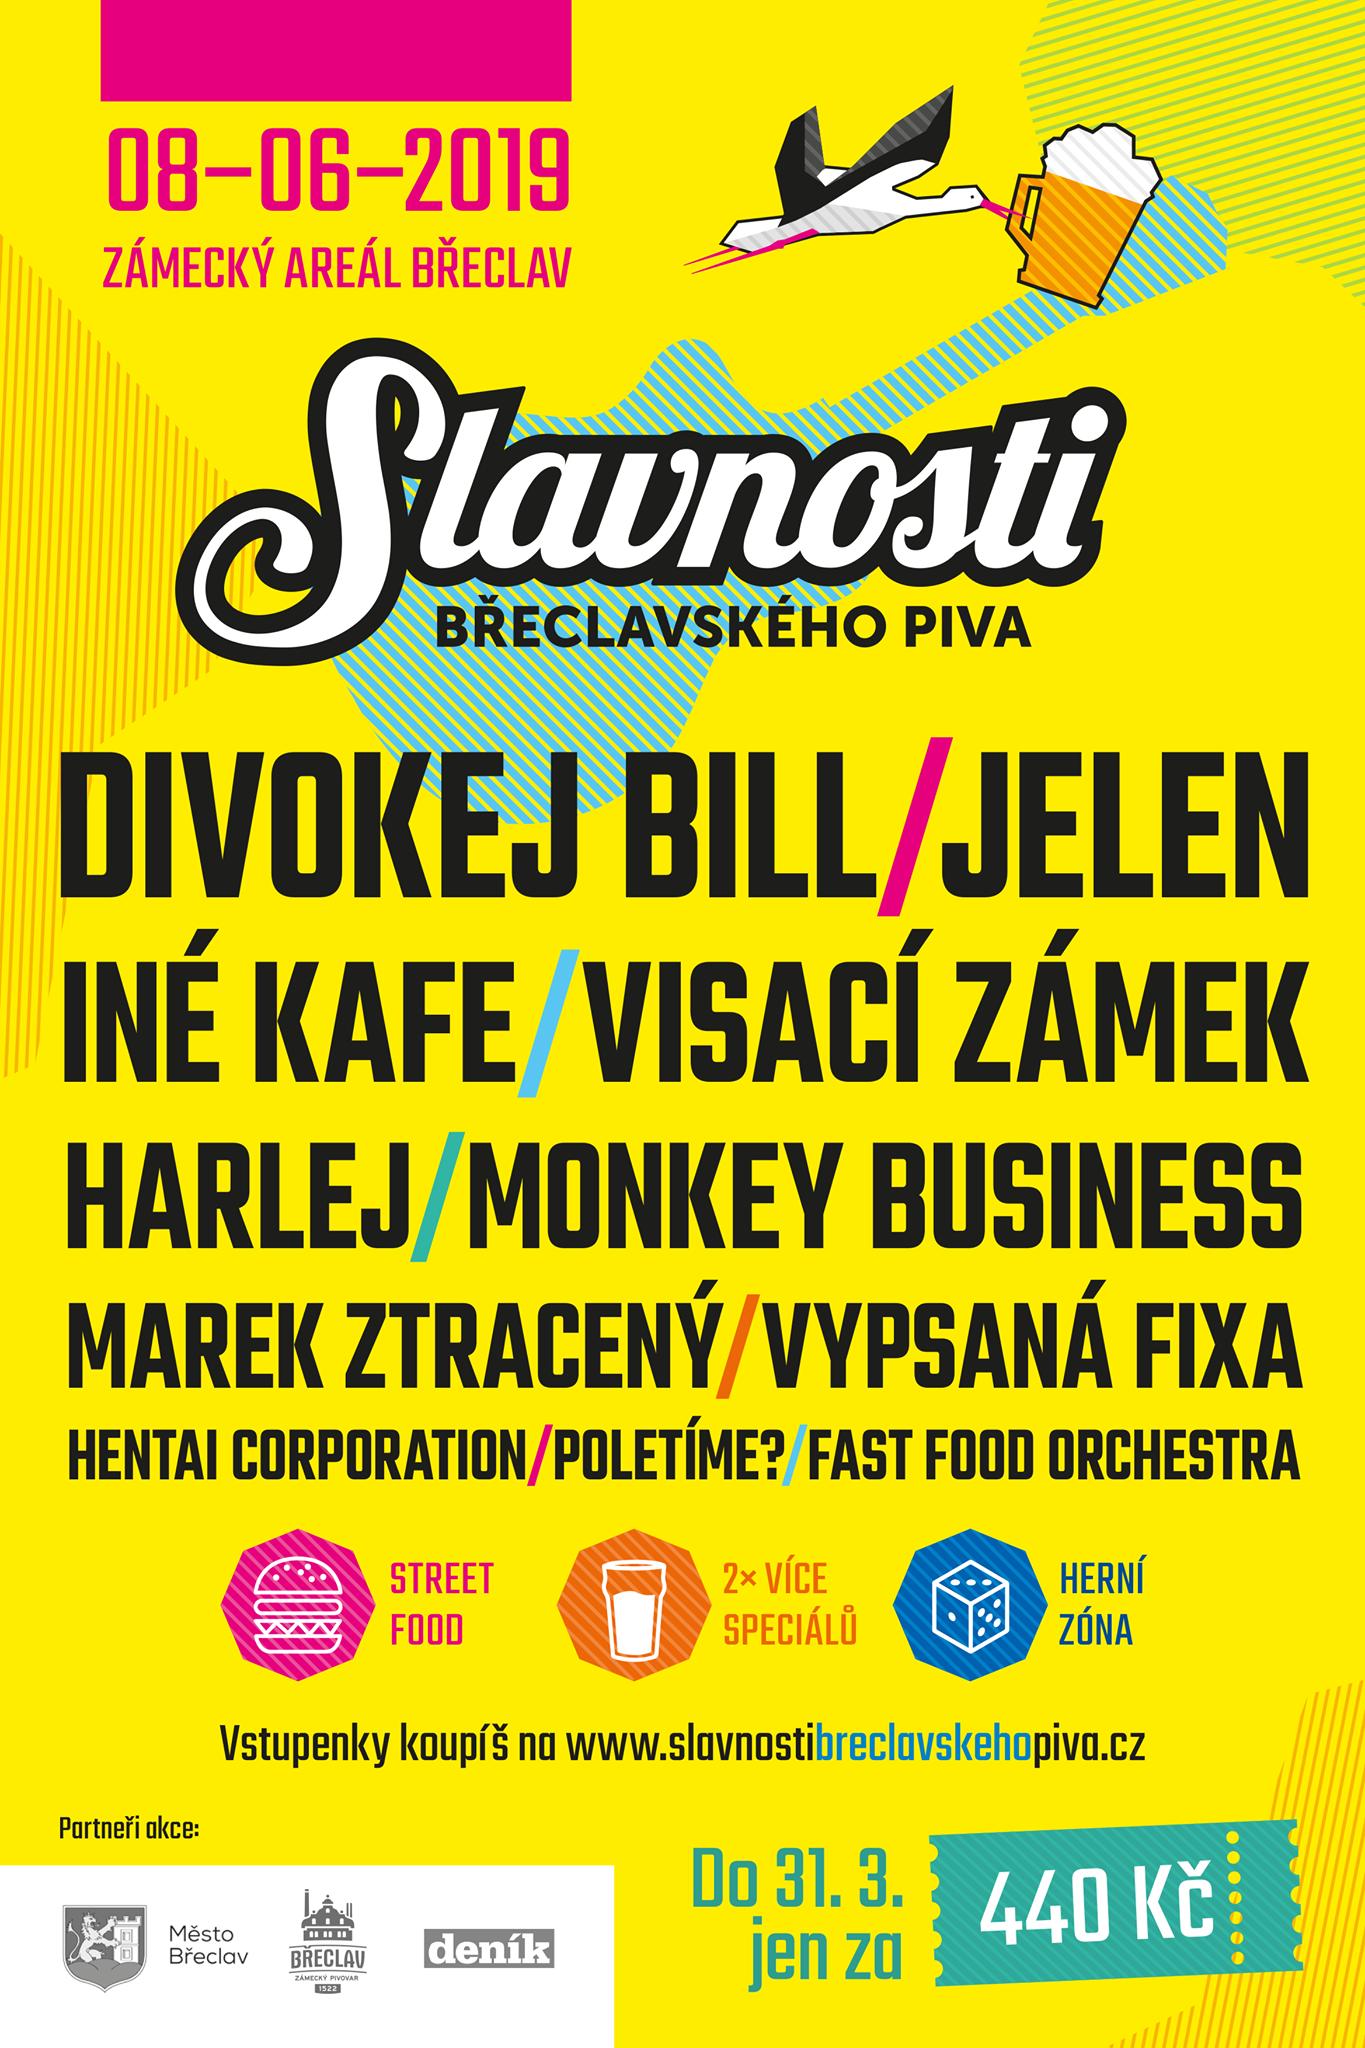 pivovari-pivovary-pivni-akce-slavnosti-breclavskeho-piva-2019